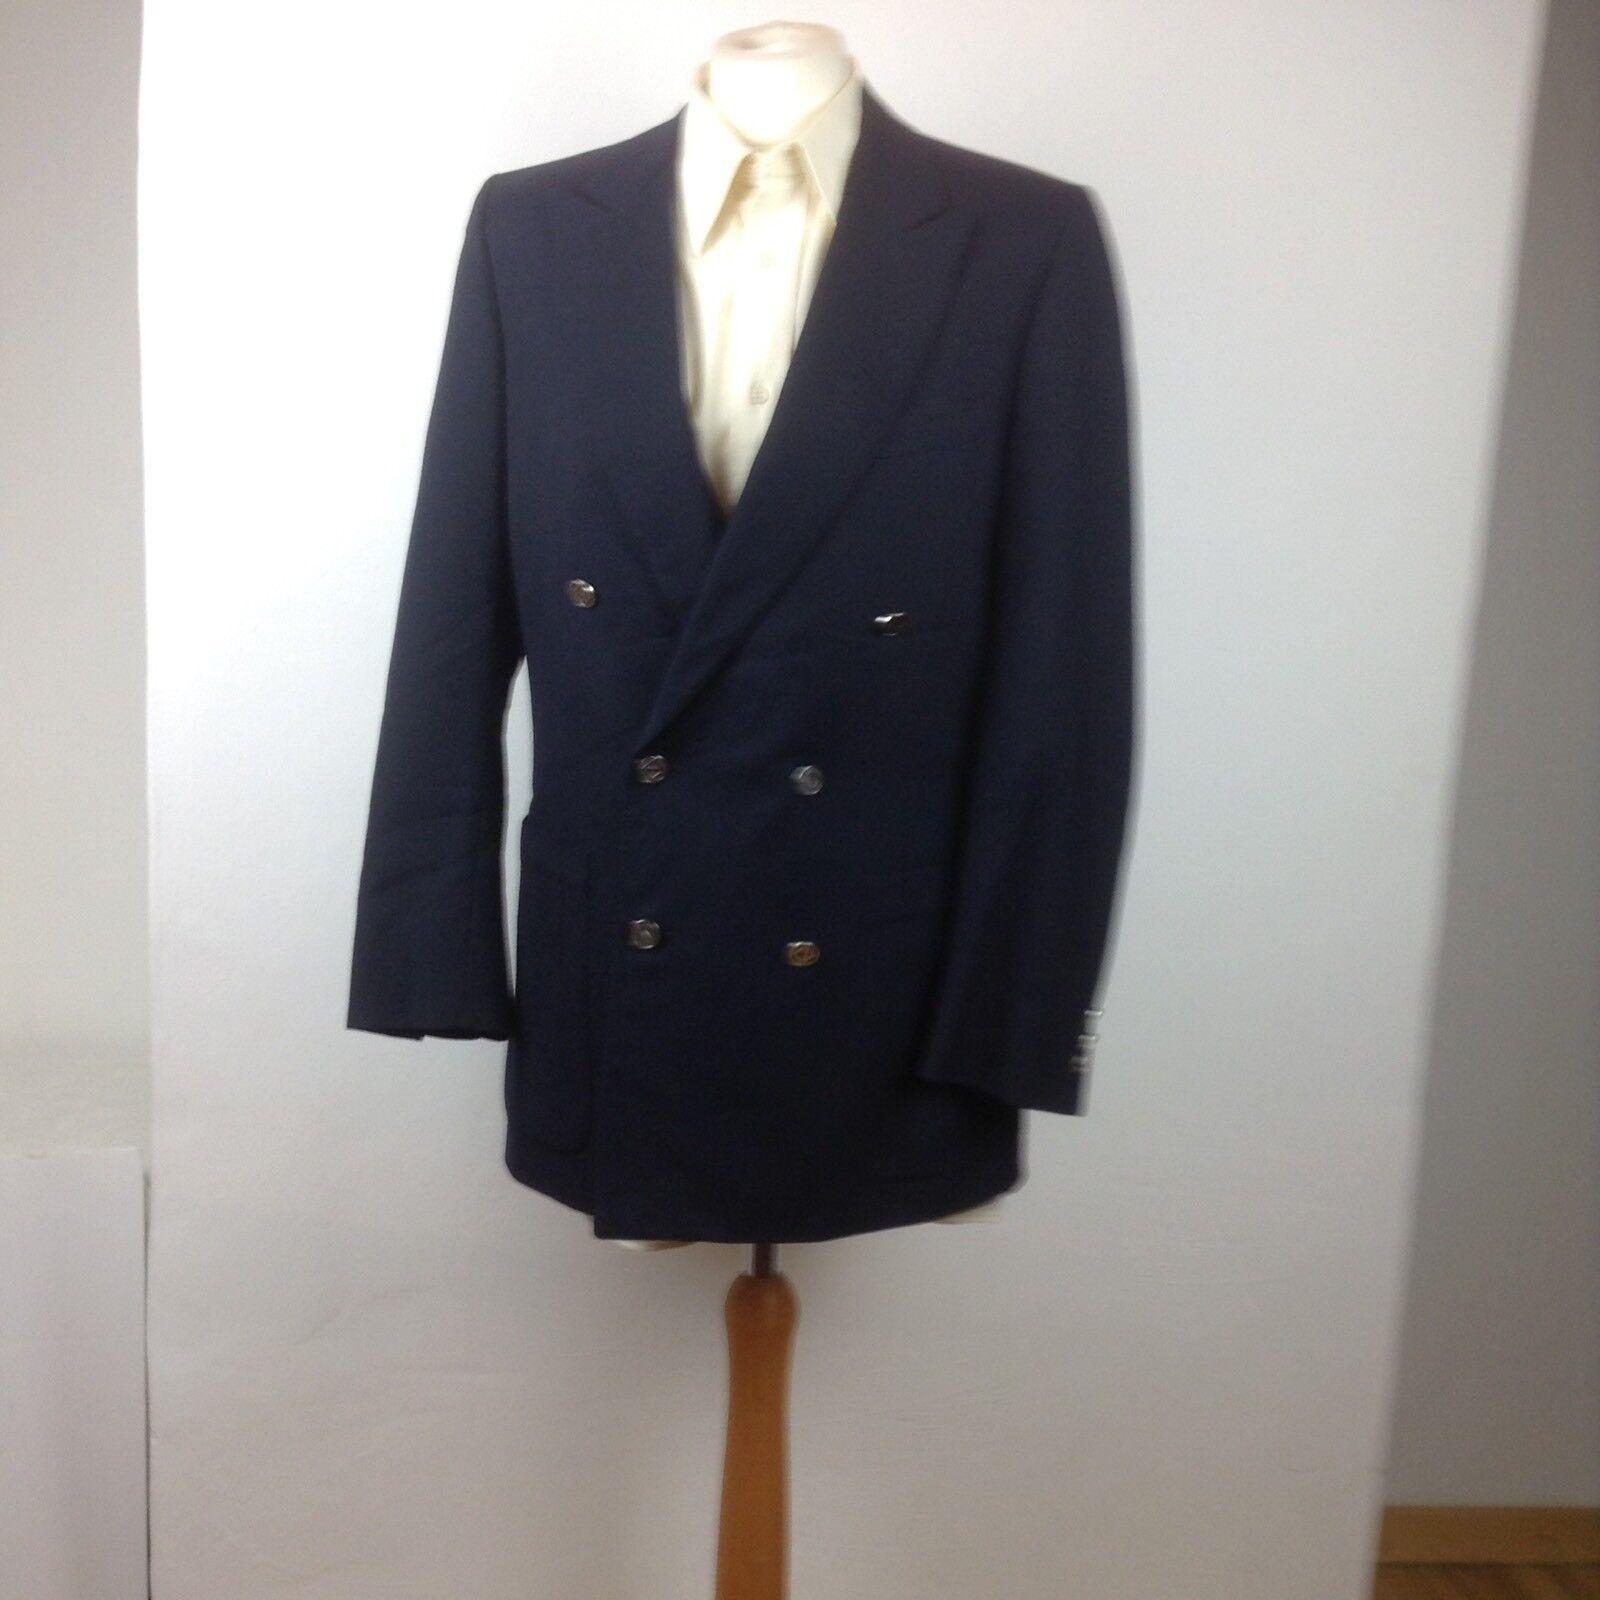 Veste Bleu Marine Dior Laine Homme Christain Vintage Blazer azqCf